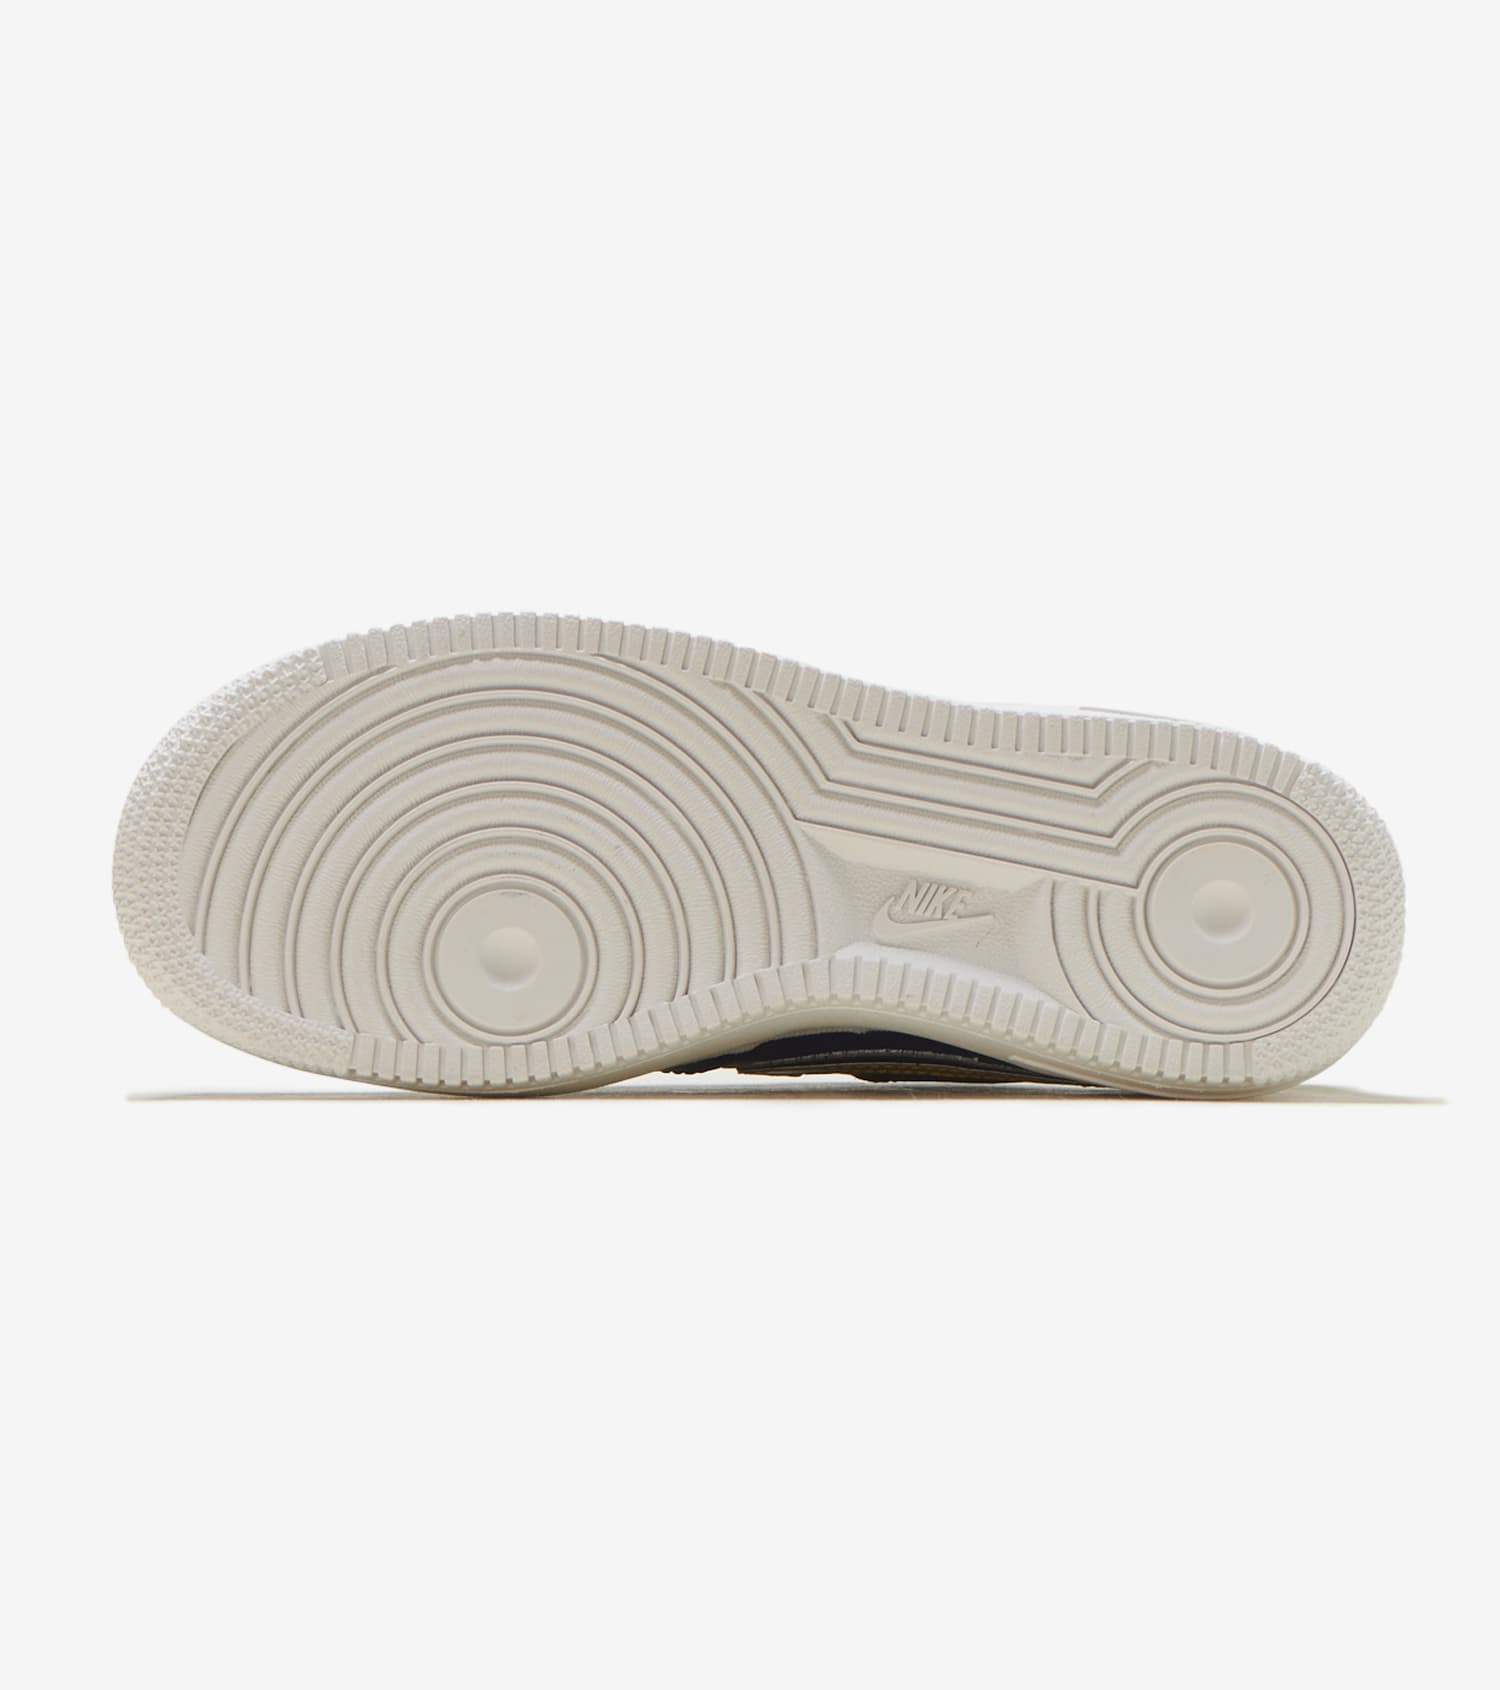 Nike Air Force 1 Low Grey Tan Blue Store List + Info